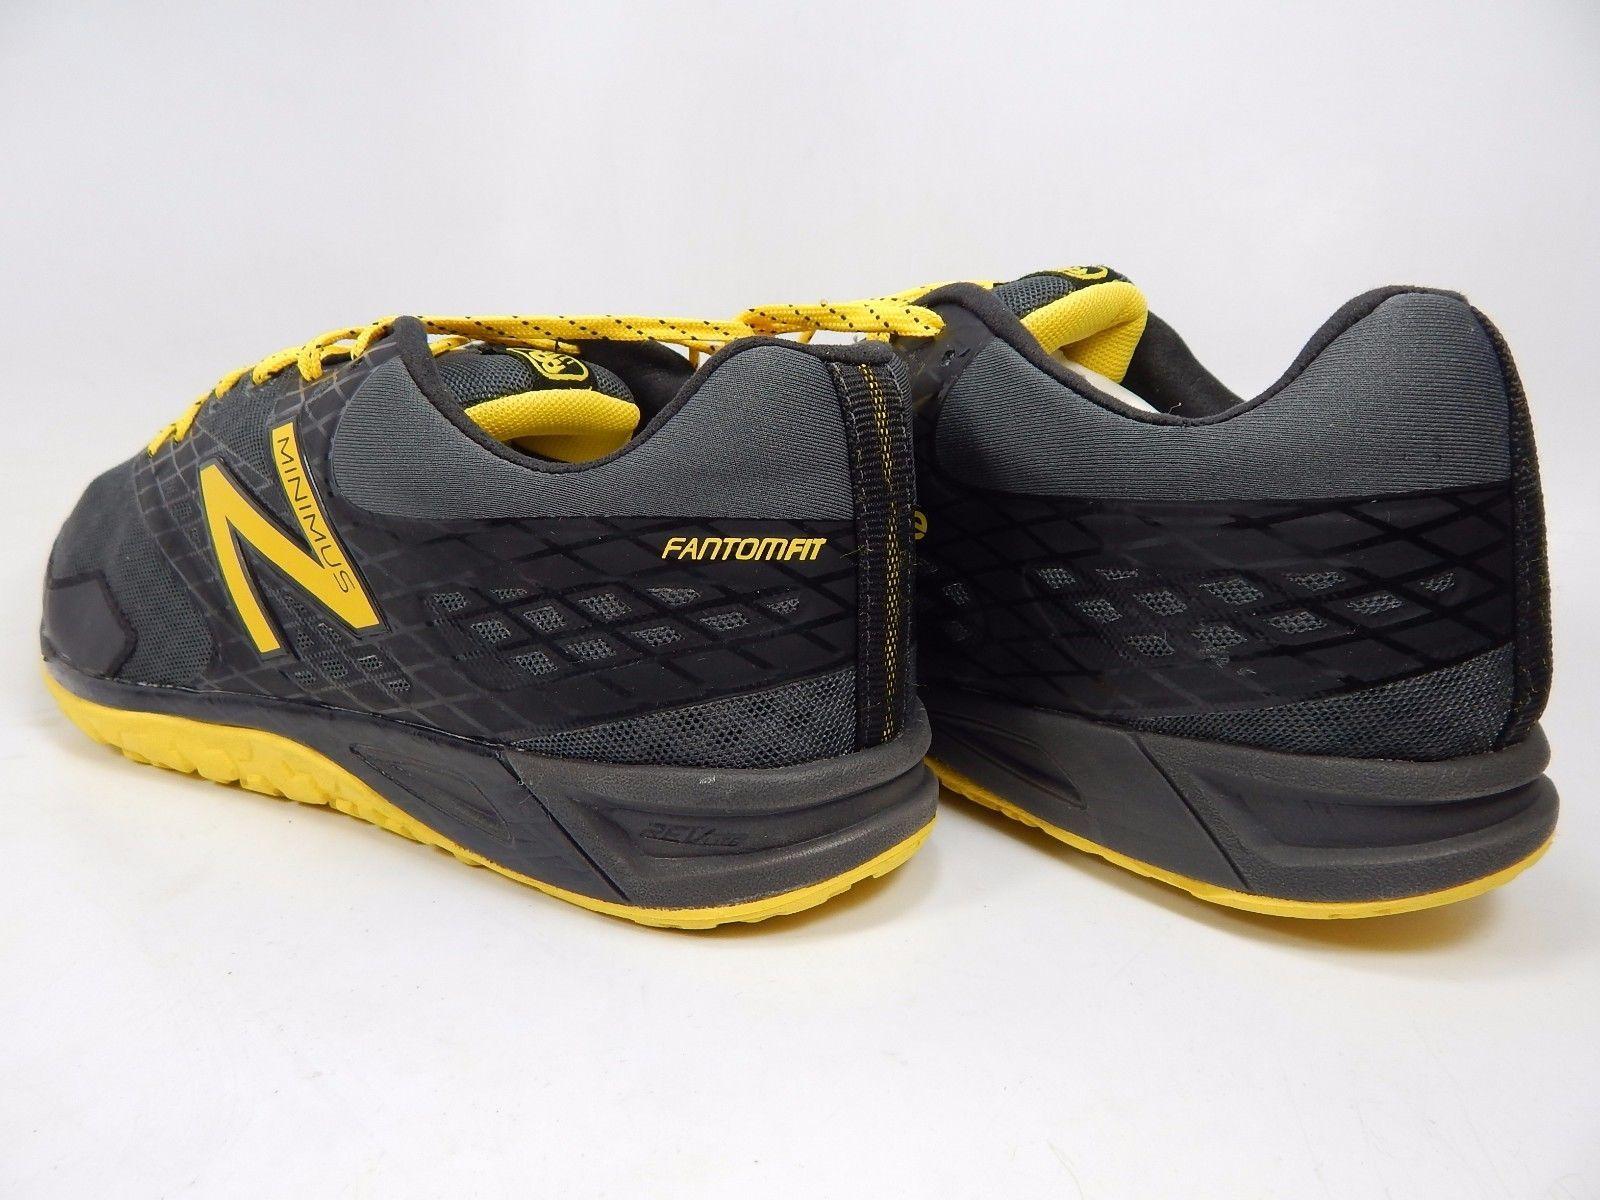 New Balance Minimus Zero Men's Cross Training Shoes Sz 8 2E WIDE EU 41.5 MX00GY